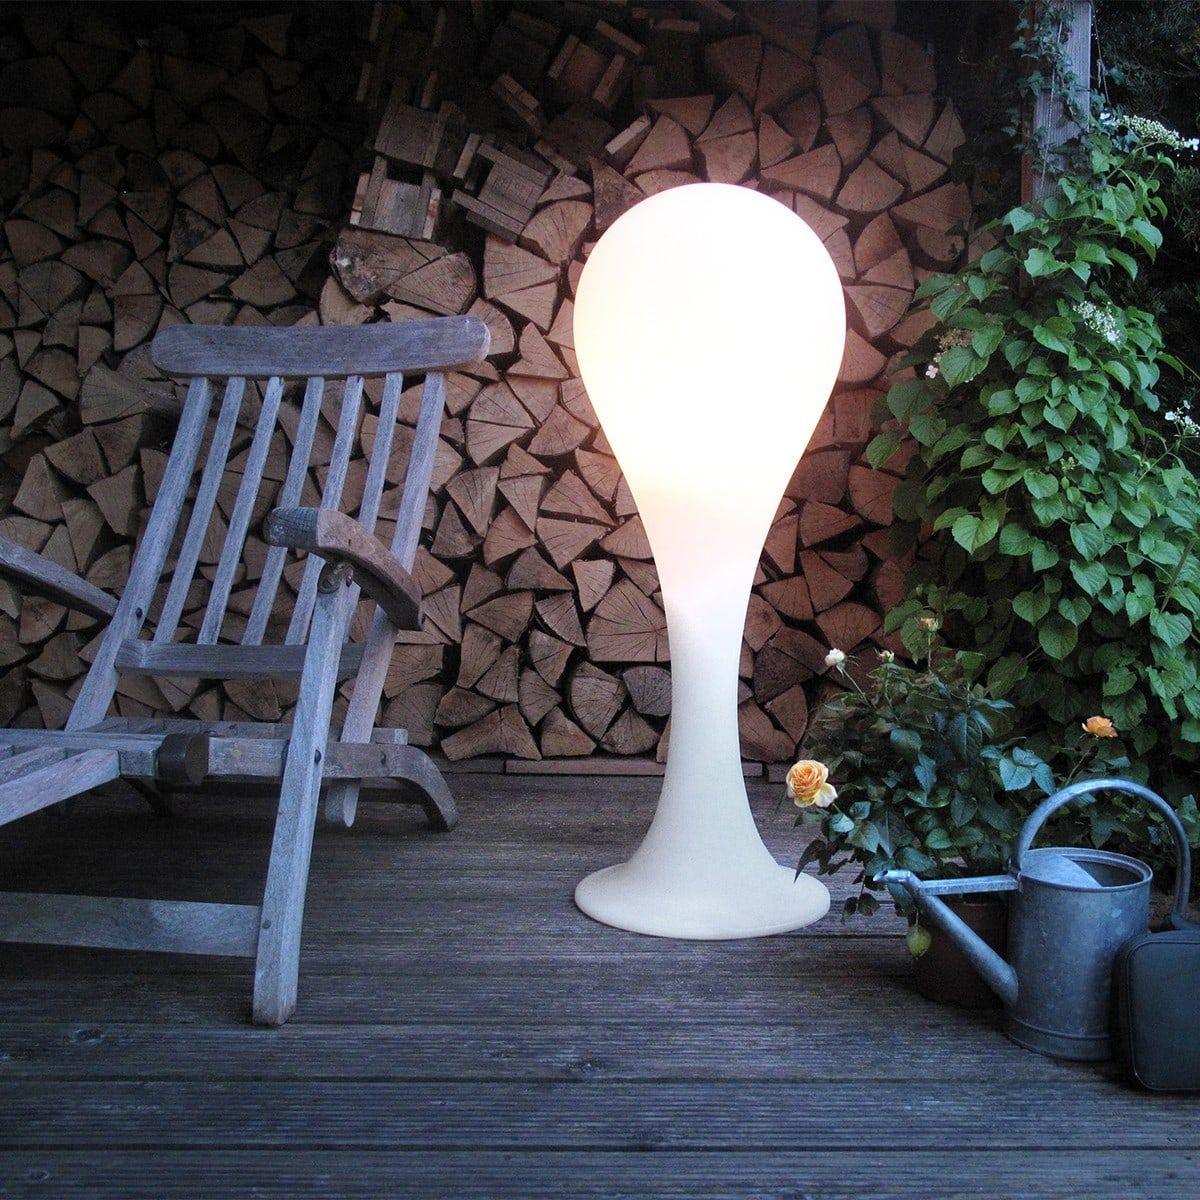 Chicago Stehlampe Kupfer Gold Kleine Stehlampe Holz